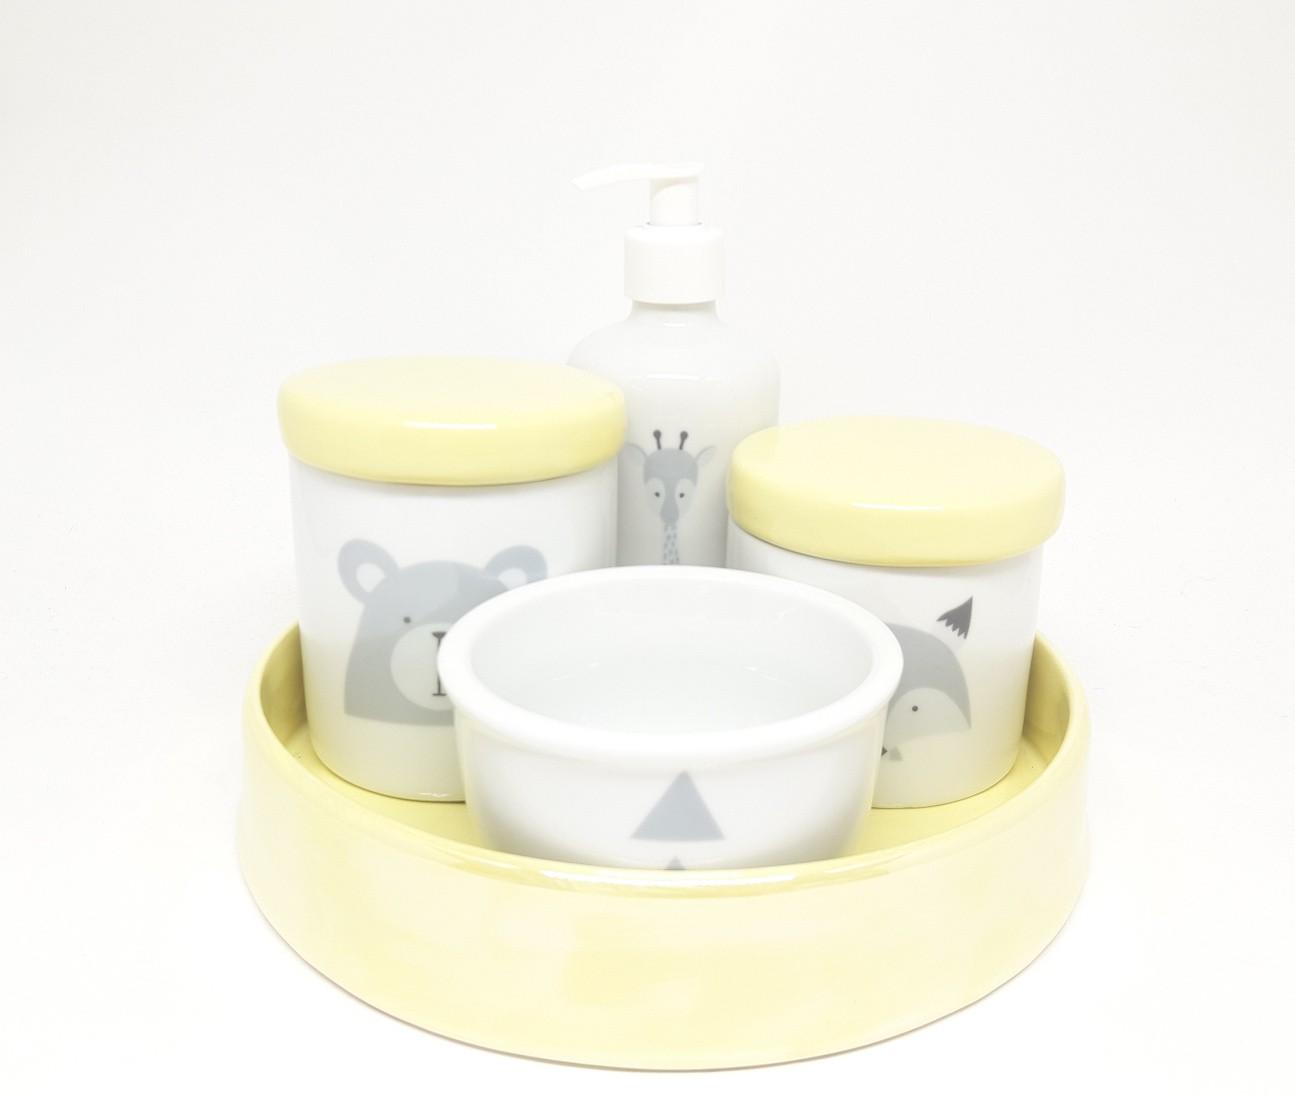 Kit Higiene Bebê Porcelana Escandinavo com Bandeja / Amarelinho